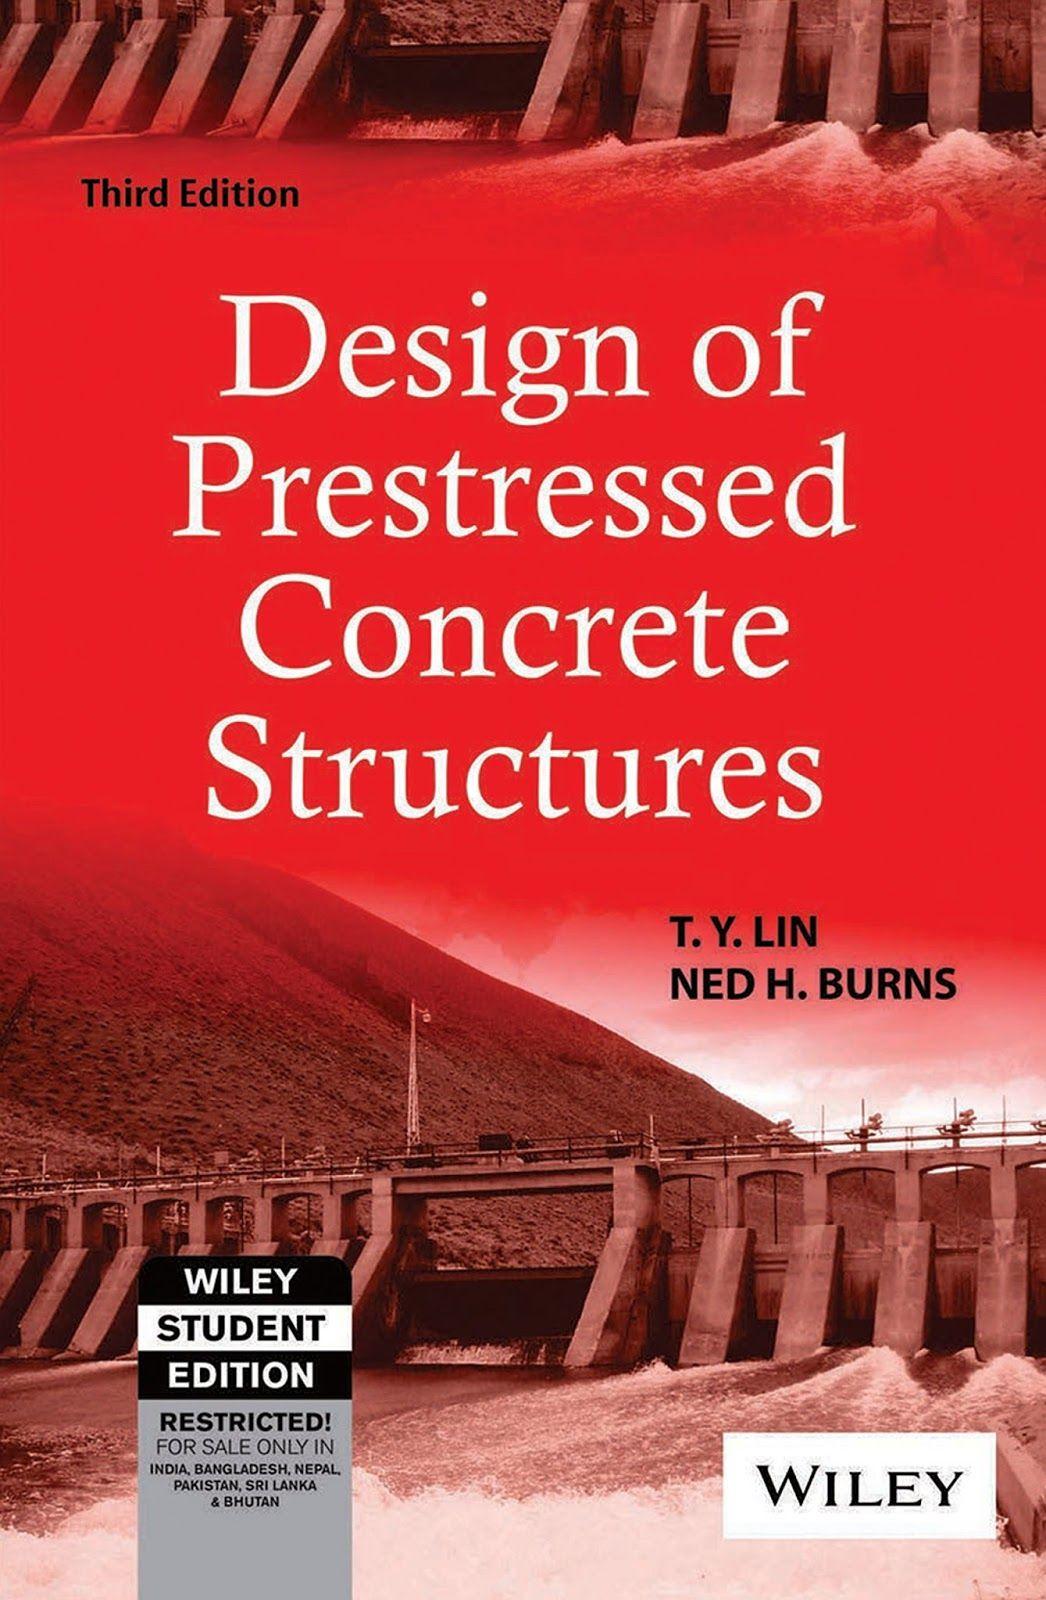 Design Of Prestressed Concrete Structures Free Pdf Concrete Structure Lins Concrete